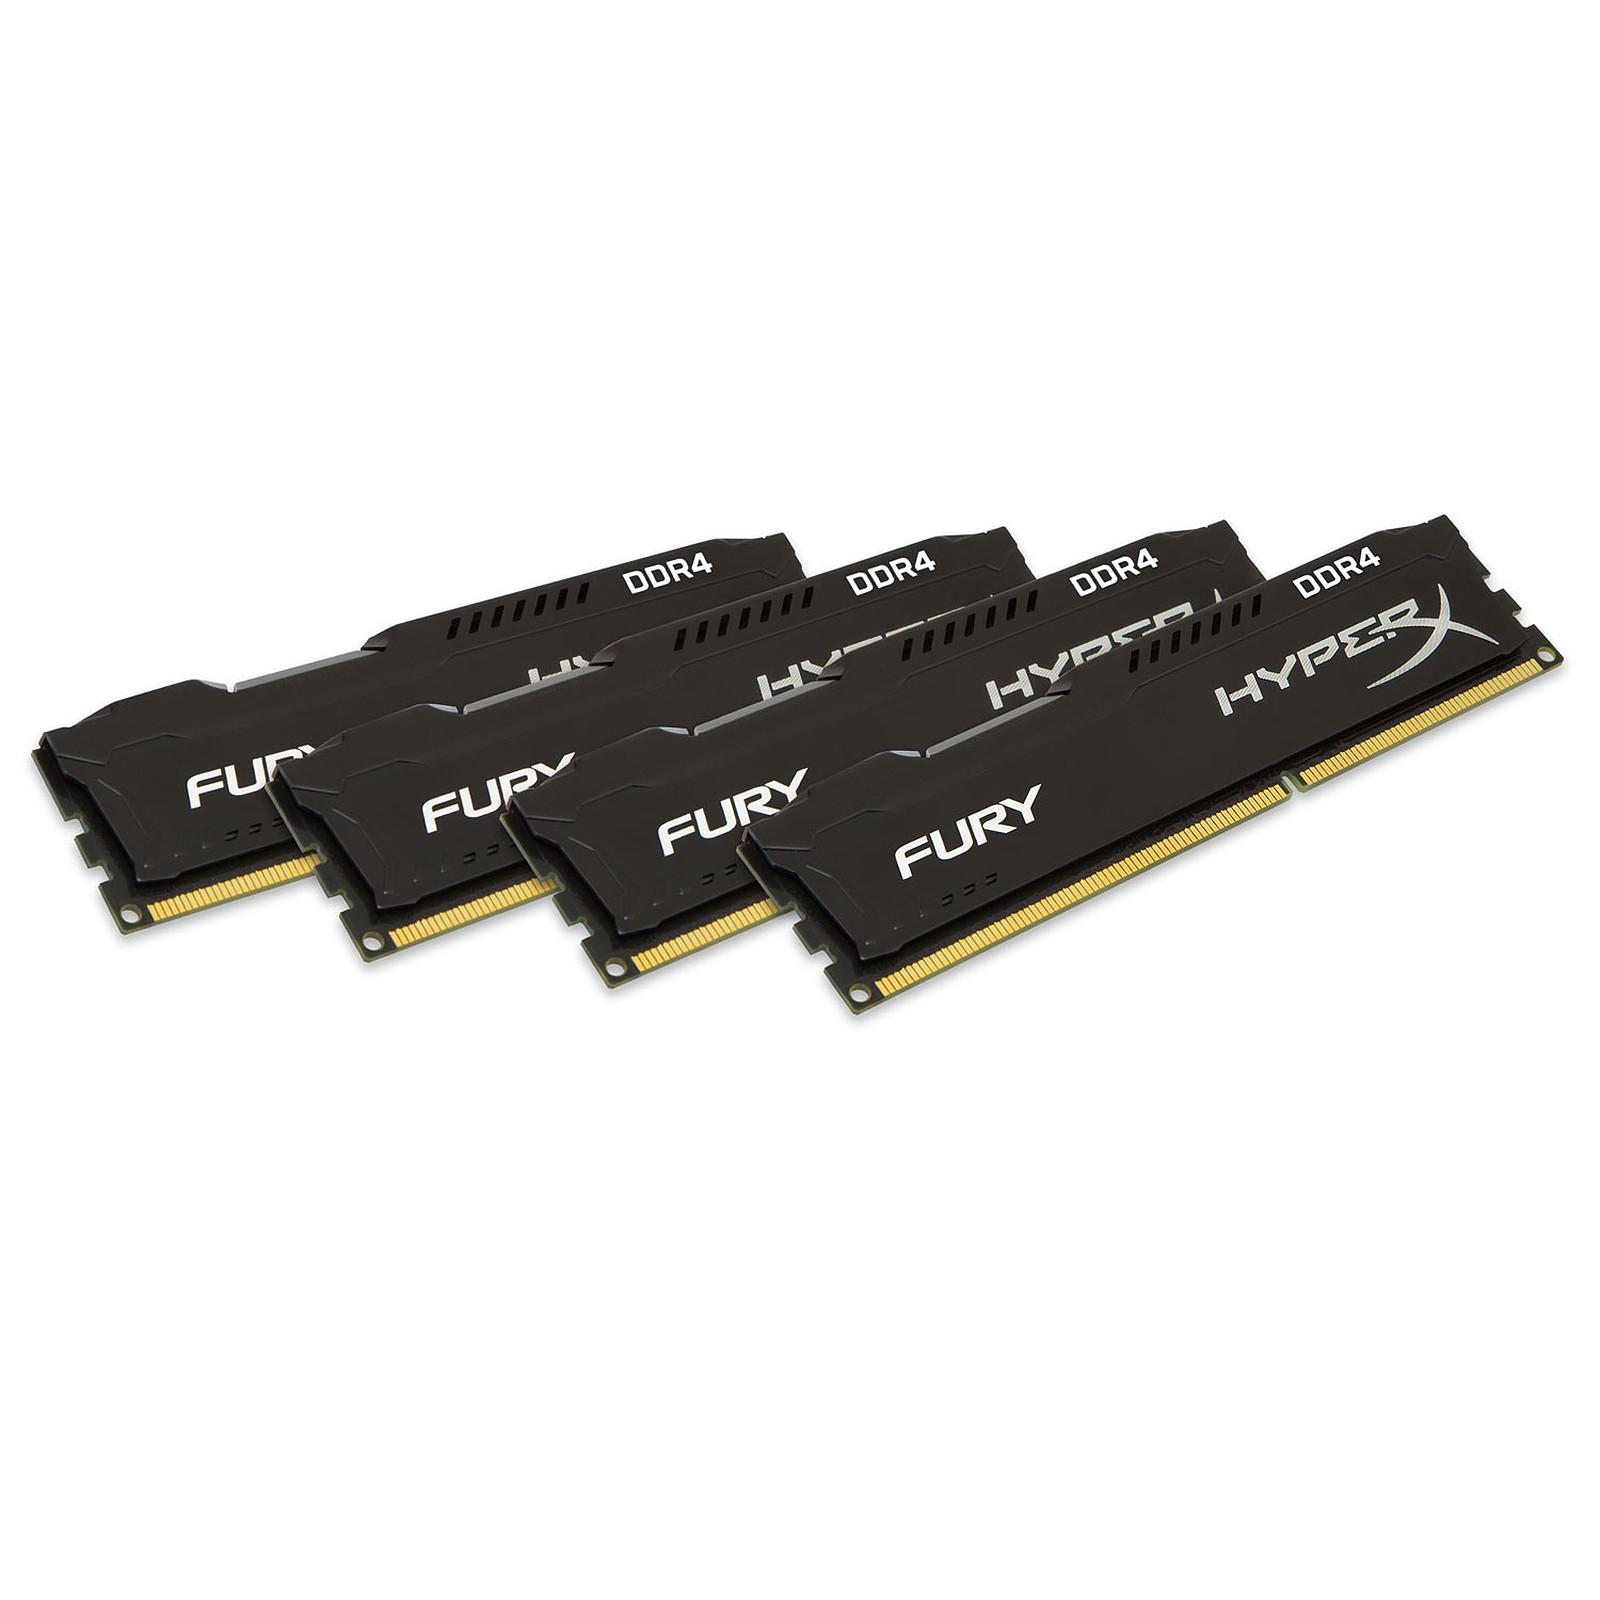 HyperX Fury Noir 16 Go (4x 4 Go) DDR4 2666 MHz CL13